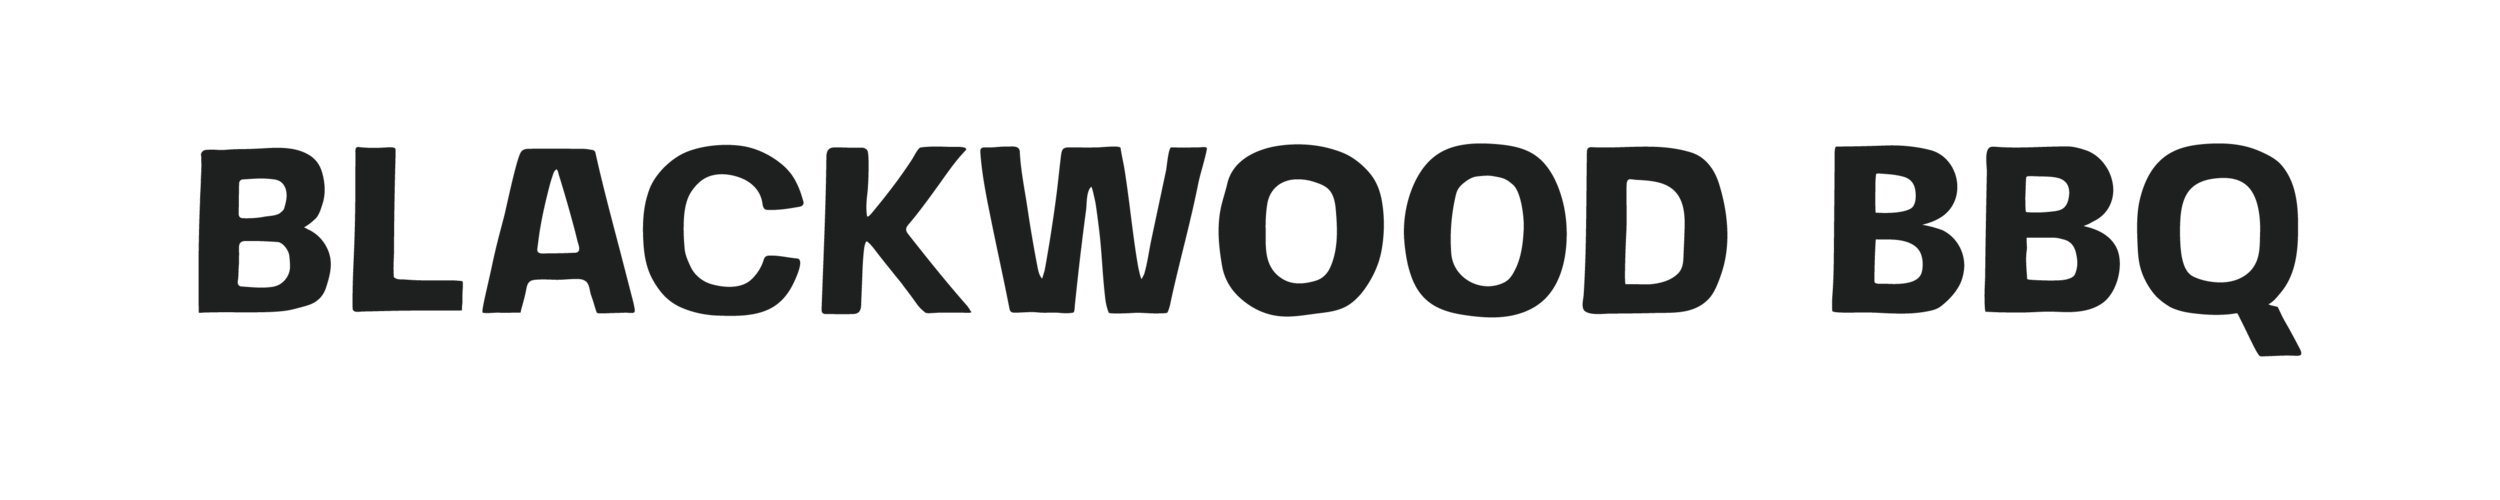 2019 Blackwood BBQ Logo-01.png